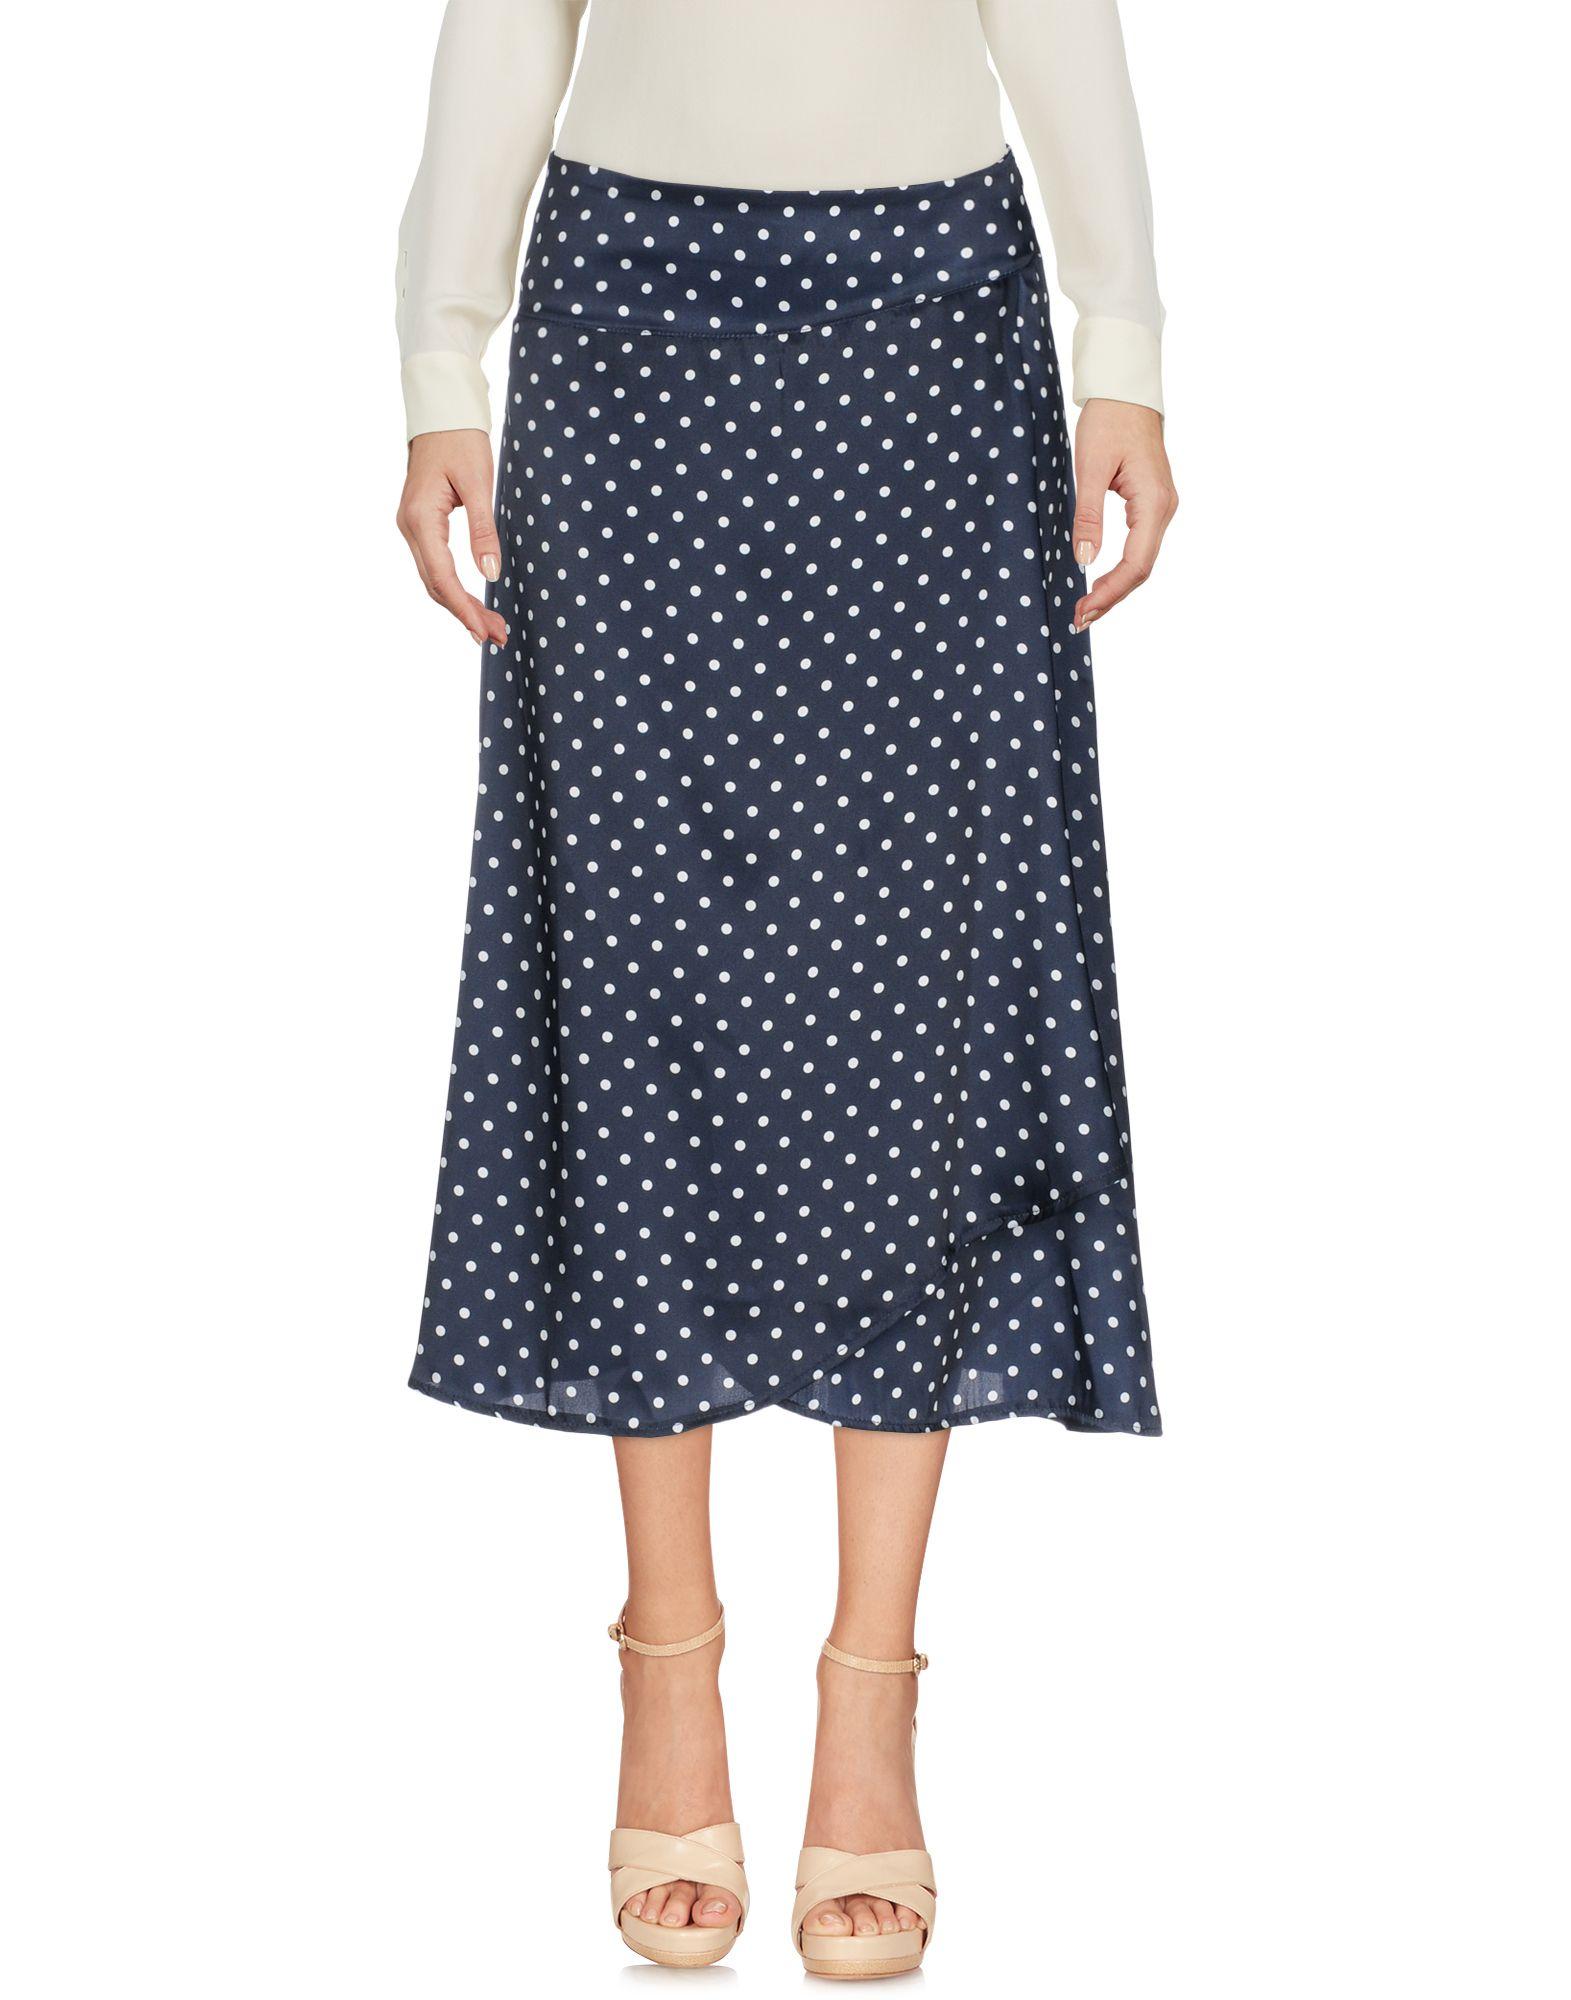 GIULIETTE BROWN Юбка длиной 3/4 moschino couture юбка длиной 3 4